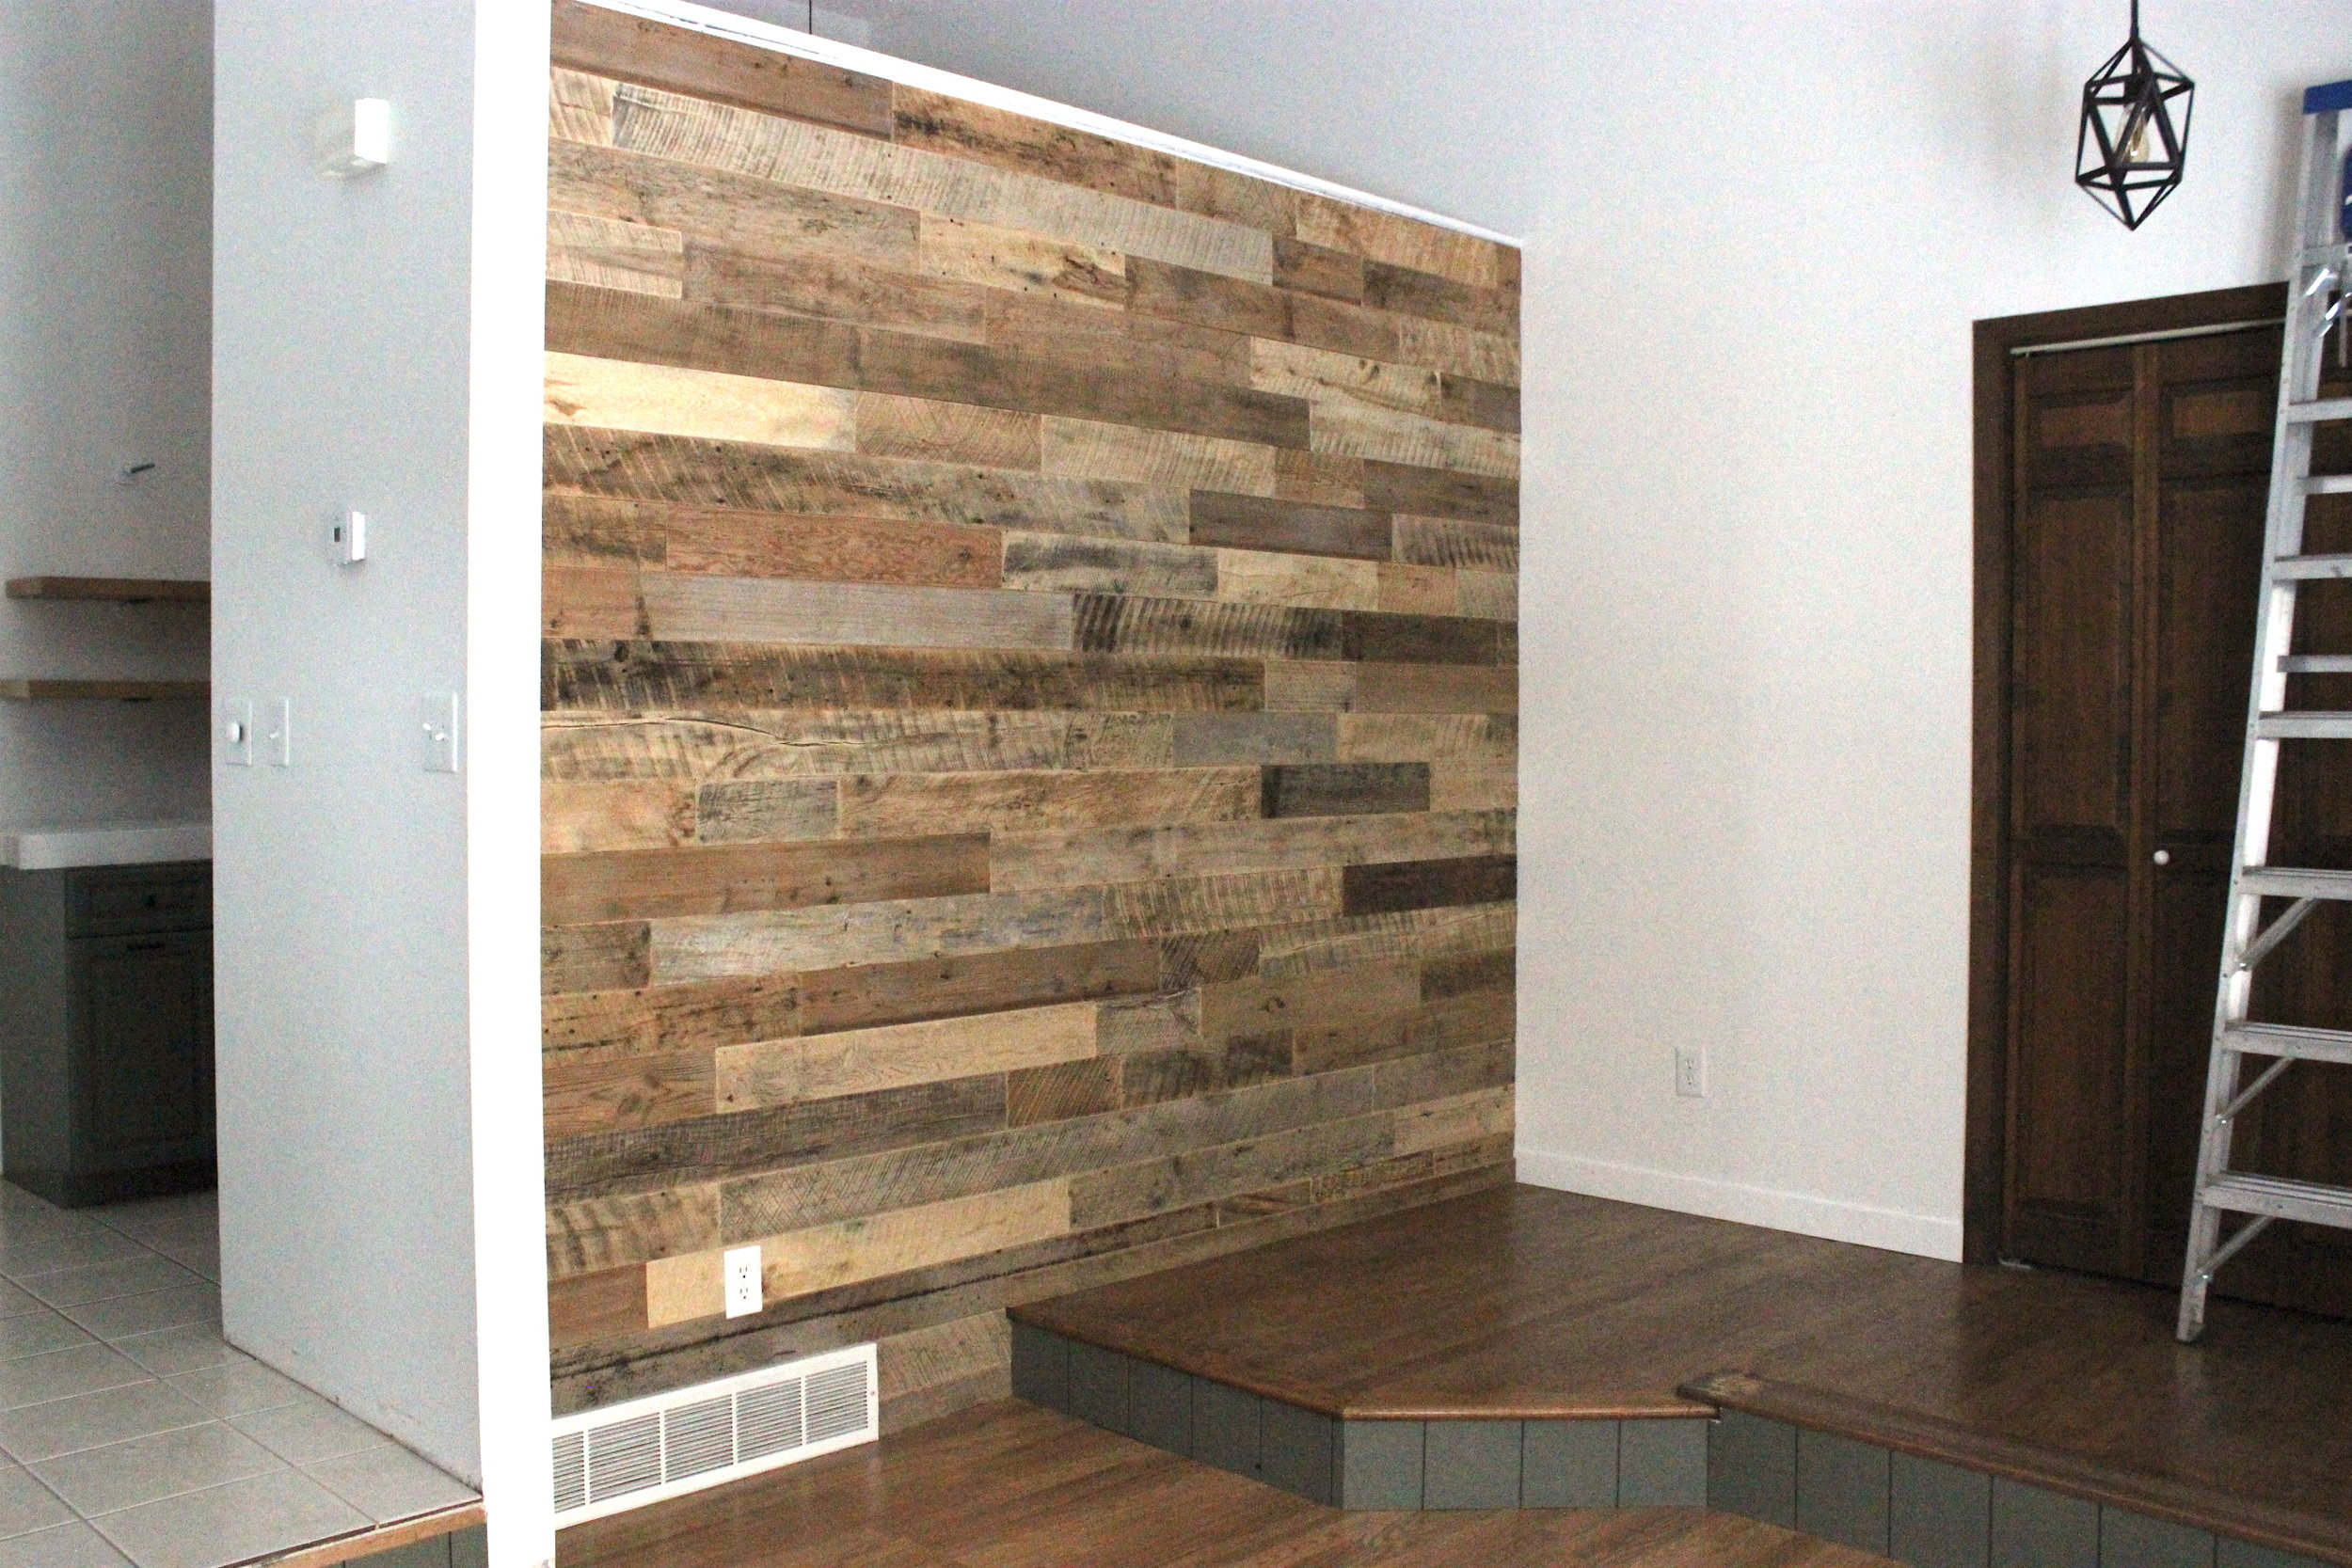 93 Reclaimed Wood Dakota Timber Co Fargo Moorhead Bismarck Finished Wall.JPG